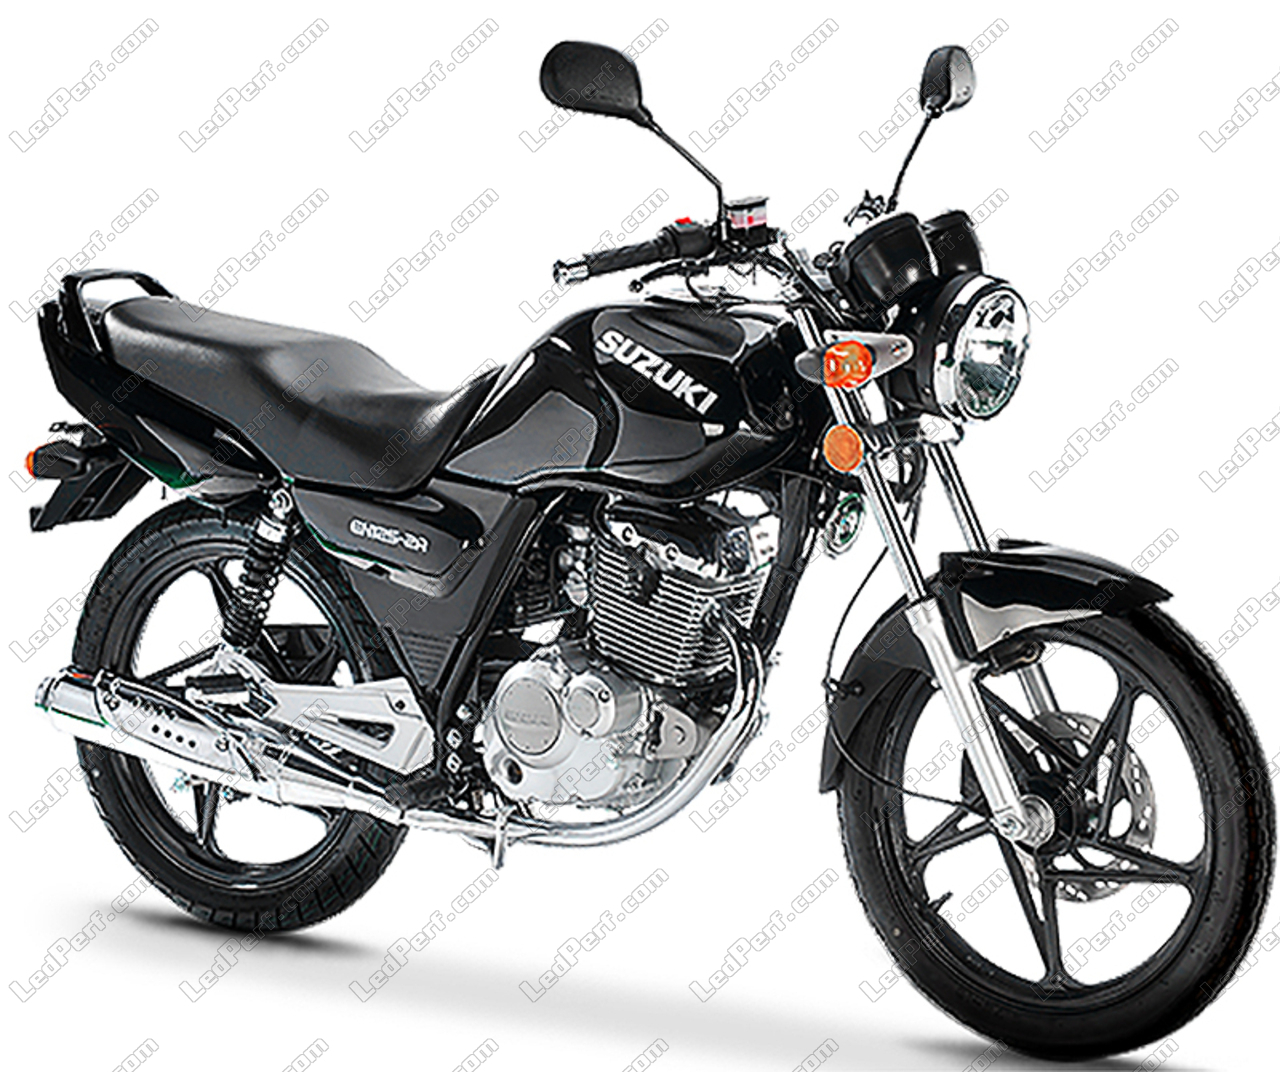 Suzuki Gn 125 Canbus Bi Xenon Hid Conversion Kit 4300k 5000k 6000k Wiring Diagram Packs Par Marque Moto Scooter Quad Ssv Spyder Led